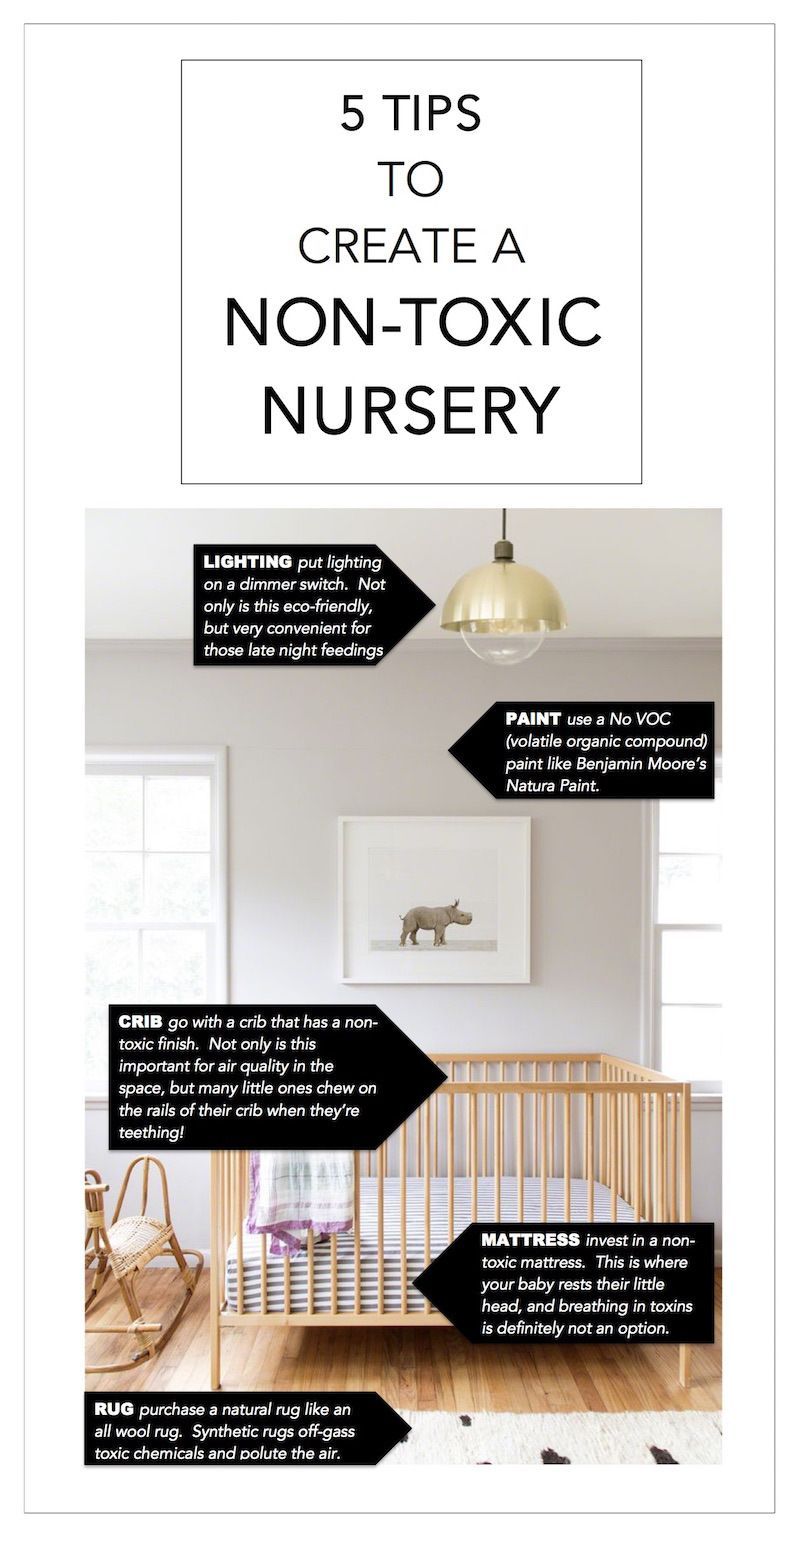 5 Tips To Create A Non Toxic Nursery 22crowns Eco Friendly Organic Boho Ikea Crib Gold Pendant Animal Print